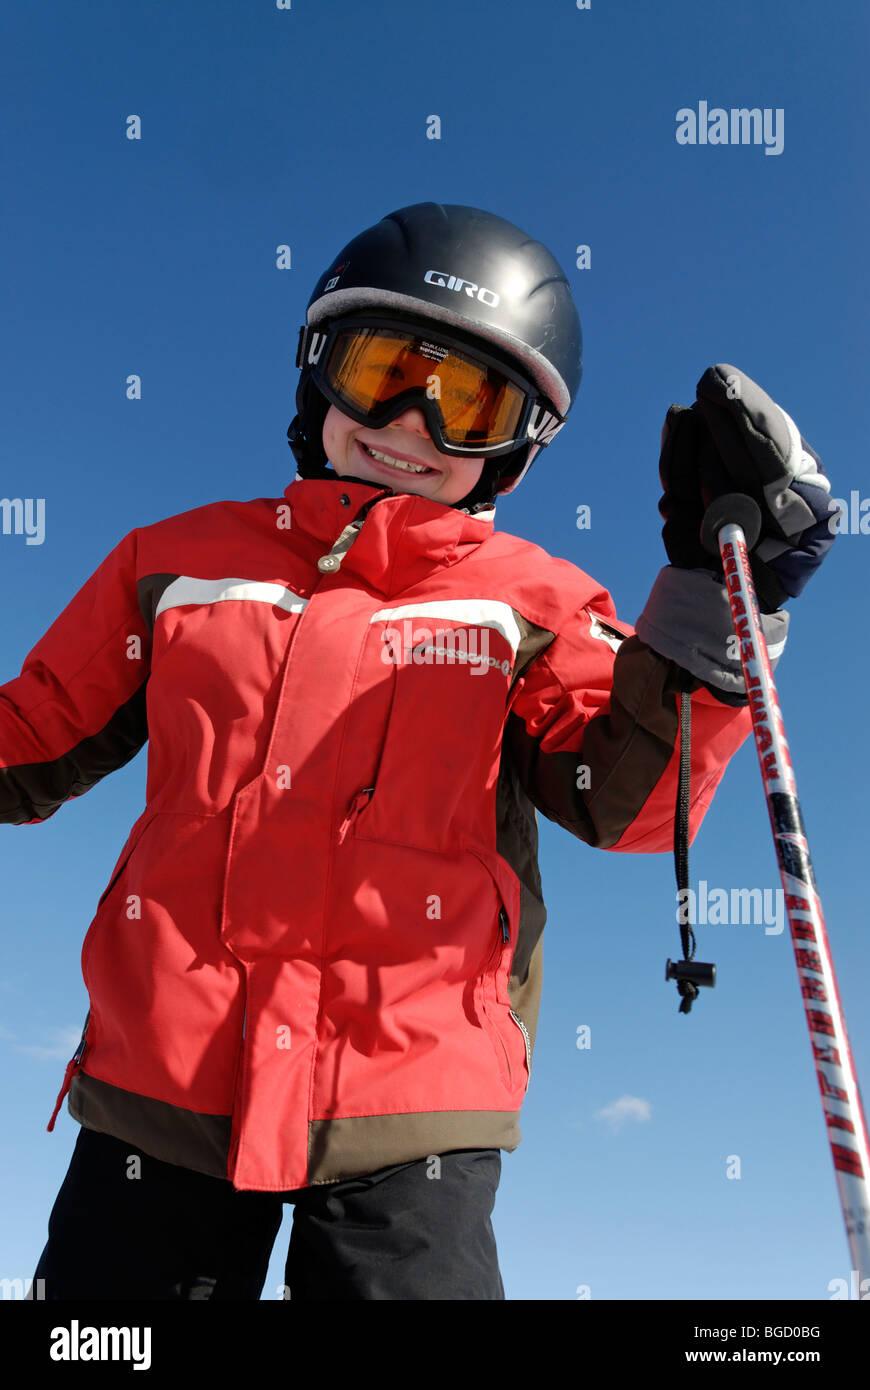 Child skiing, ski-run. alpine skiing with helmet, safety - Stock Image